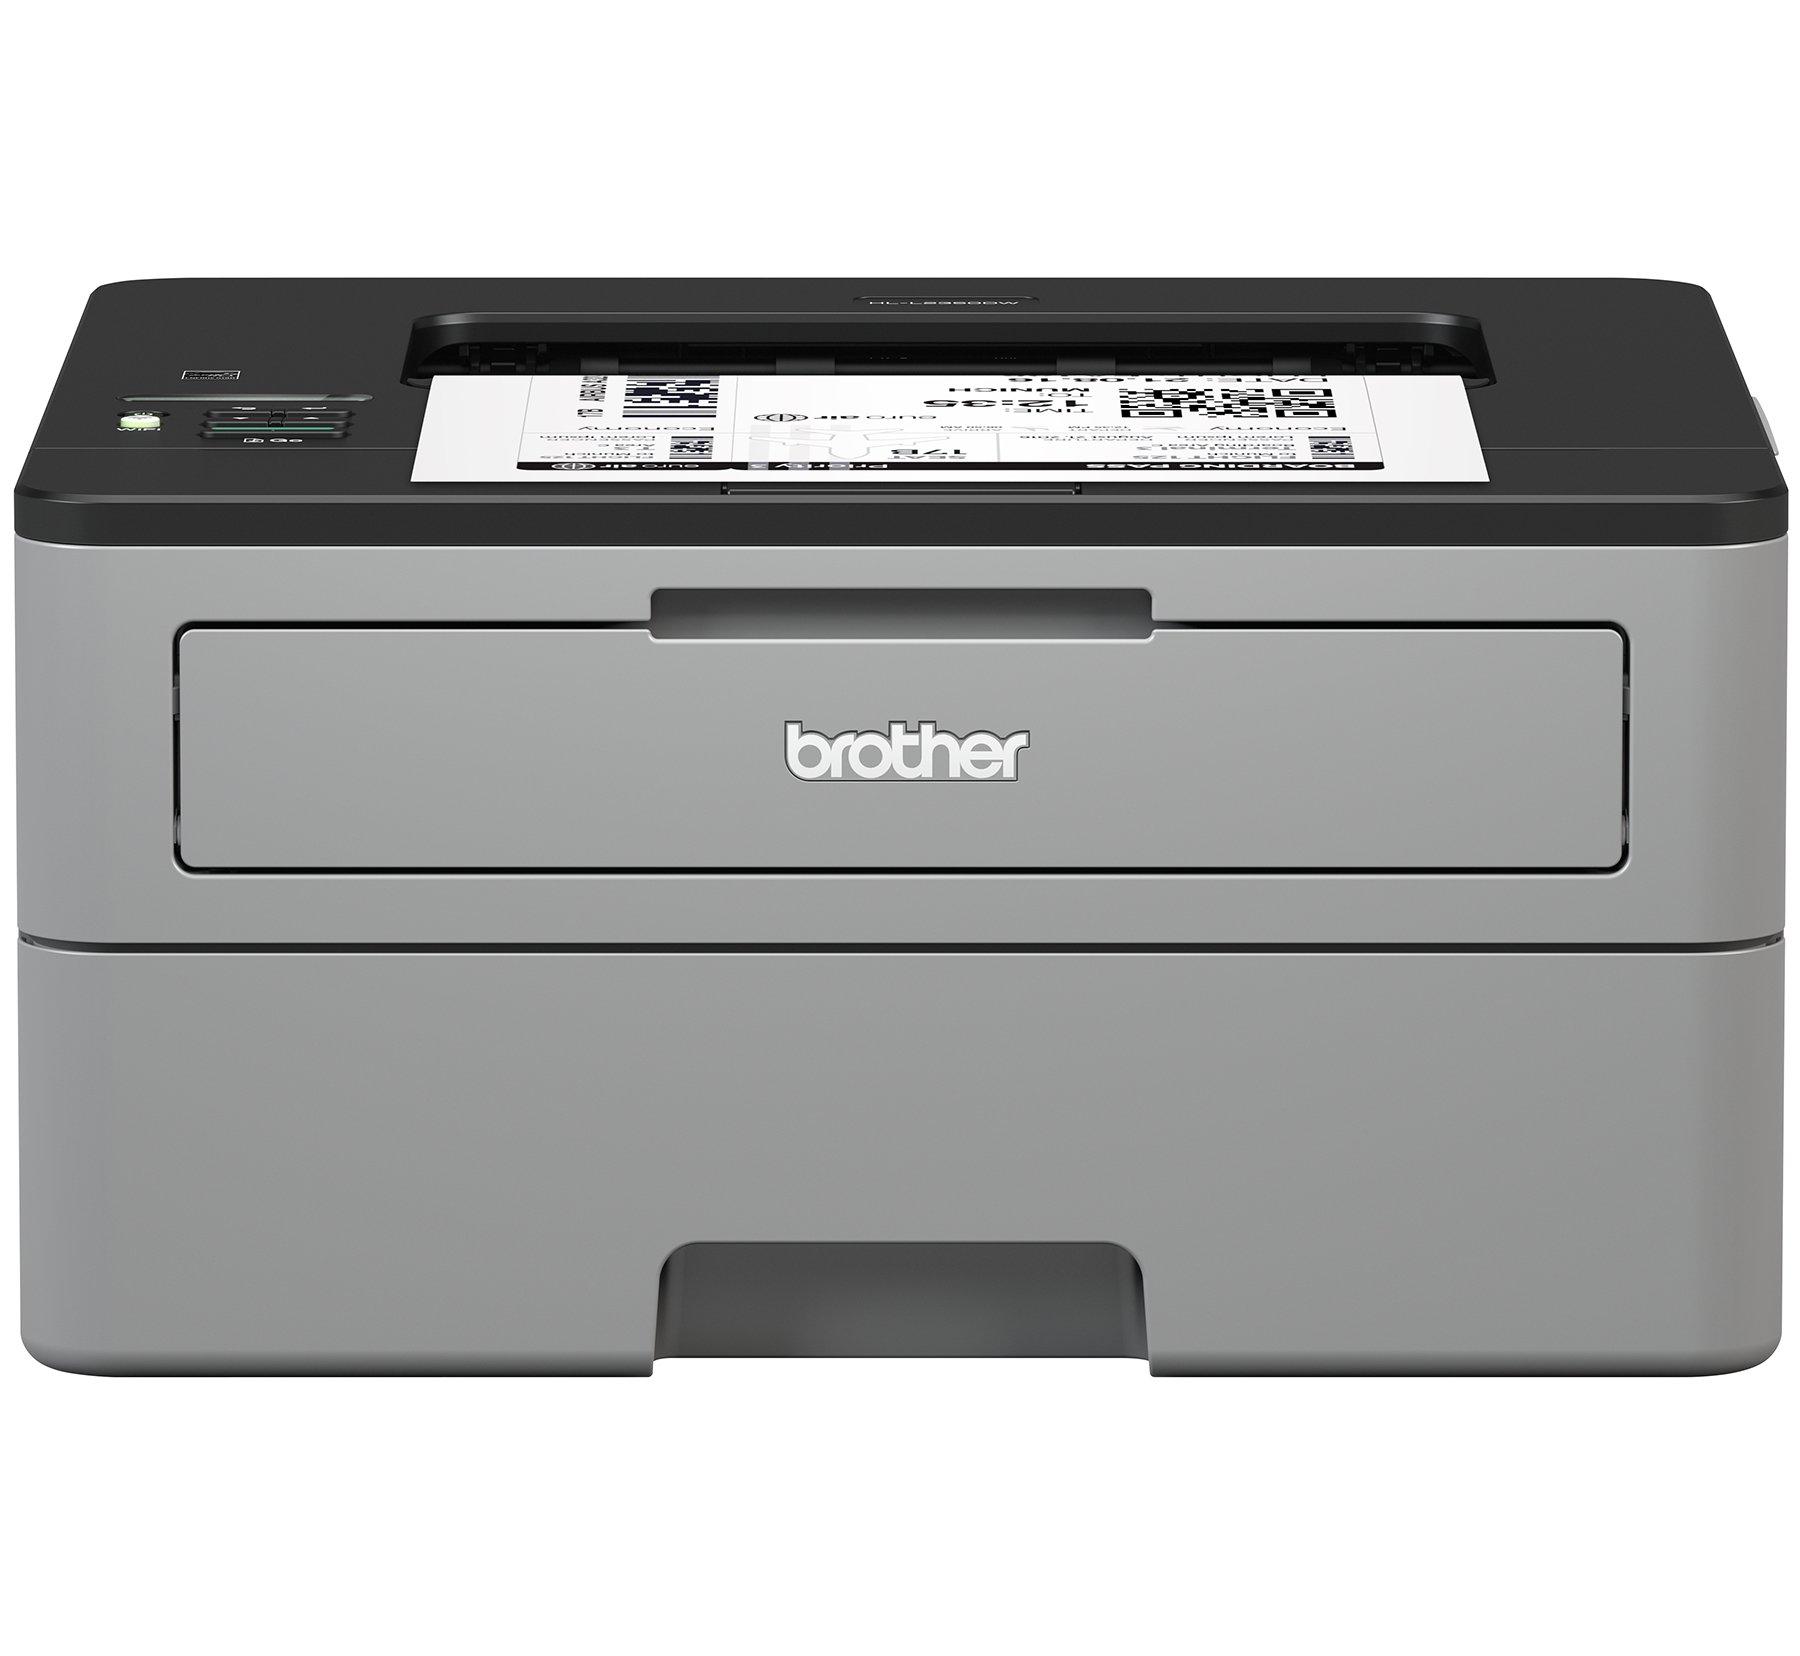 Brother HL-L2350DW  Monochrome Wireless Duplex Laser Printer Refurbished $79.99 + free  ground shipping